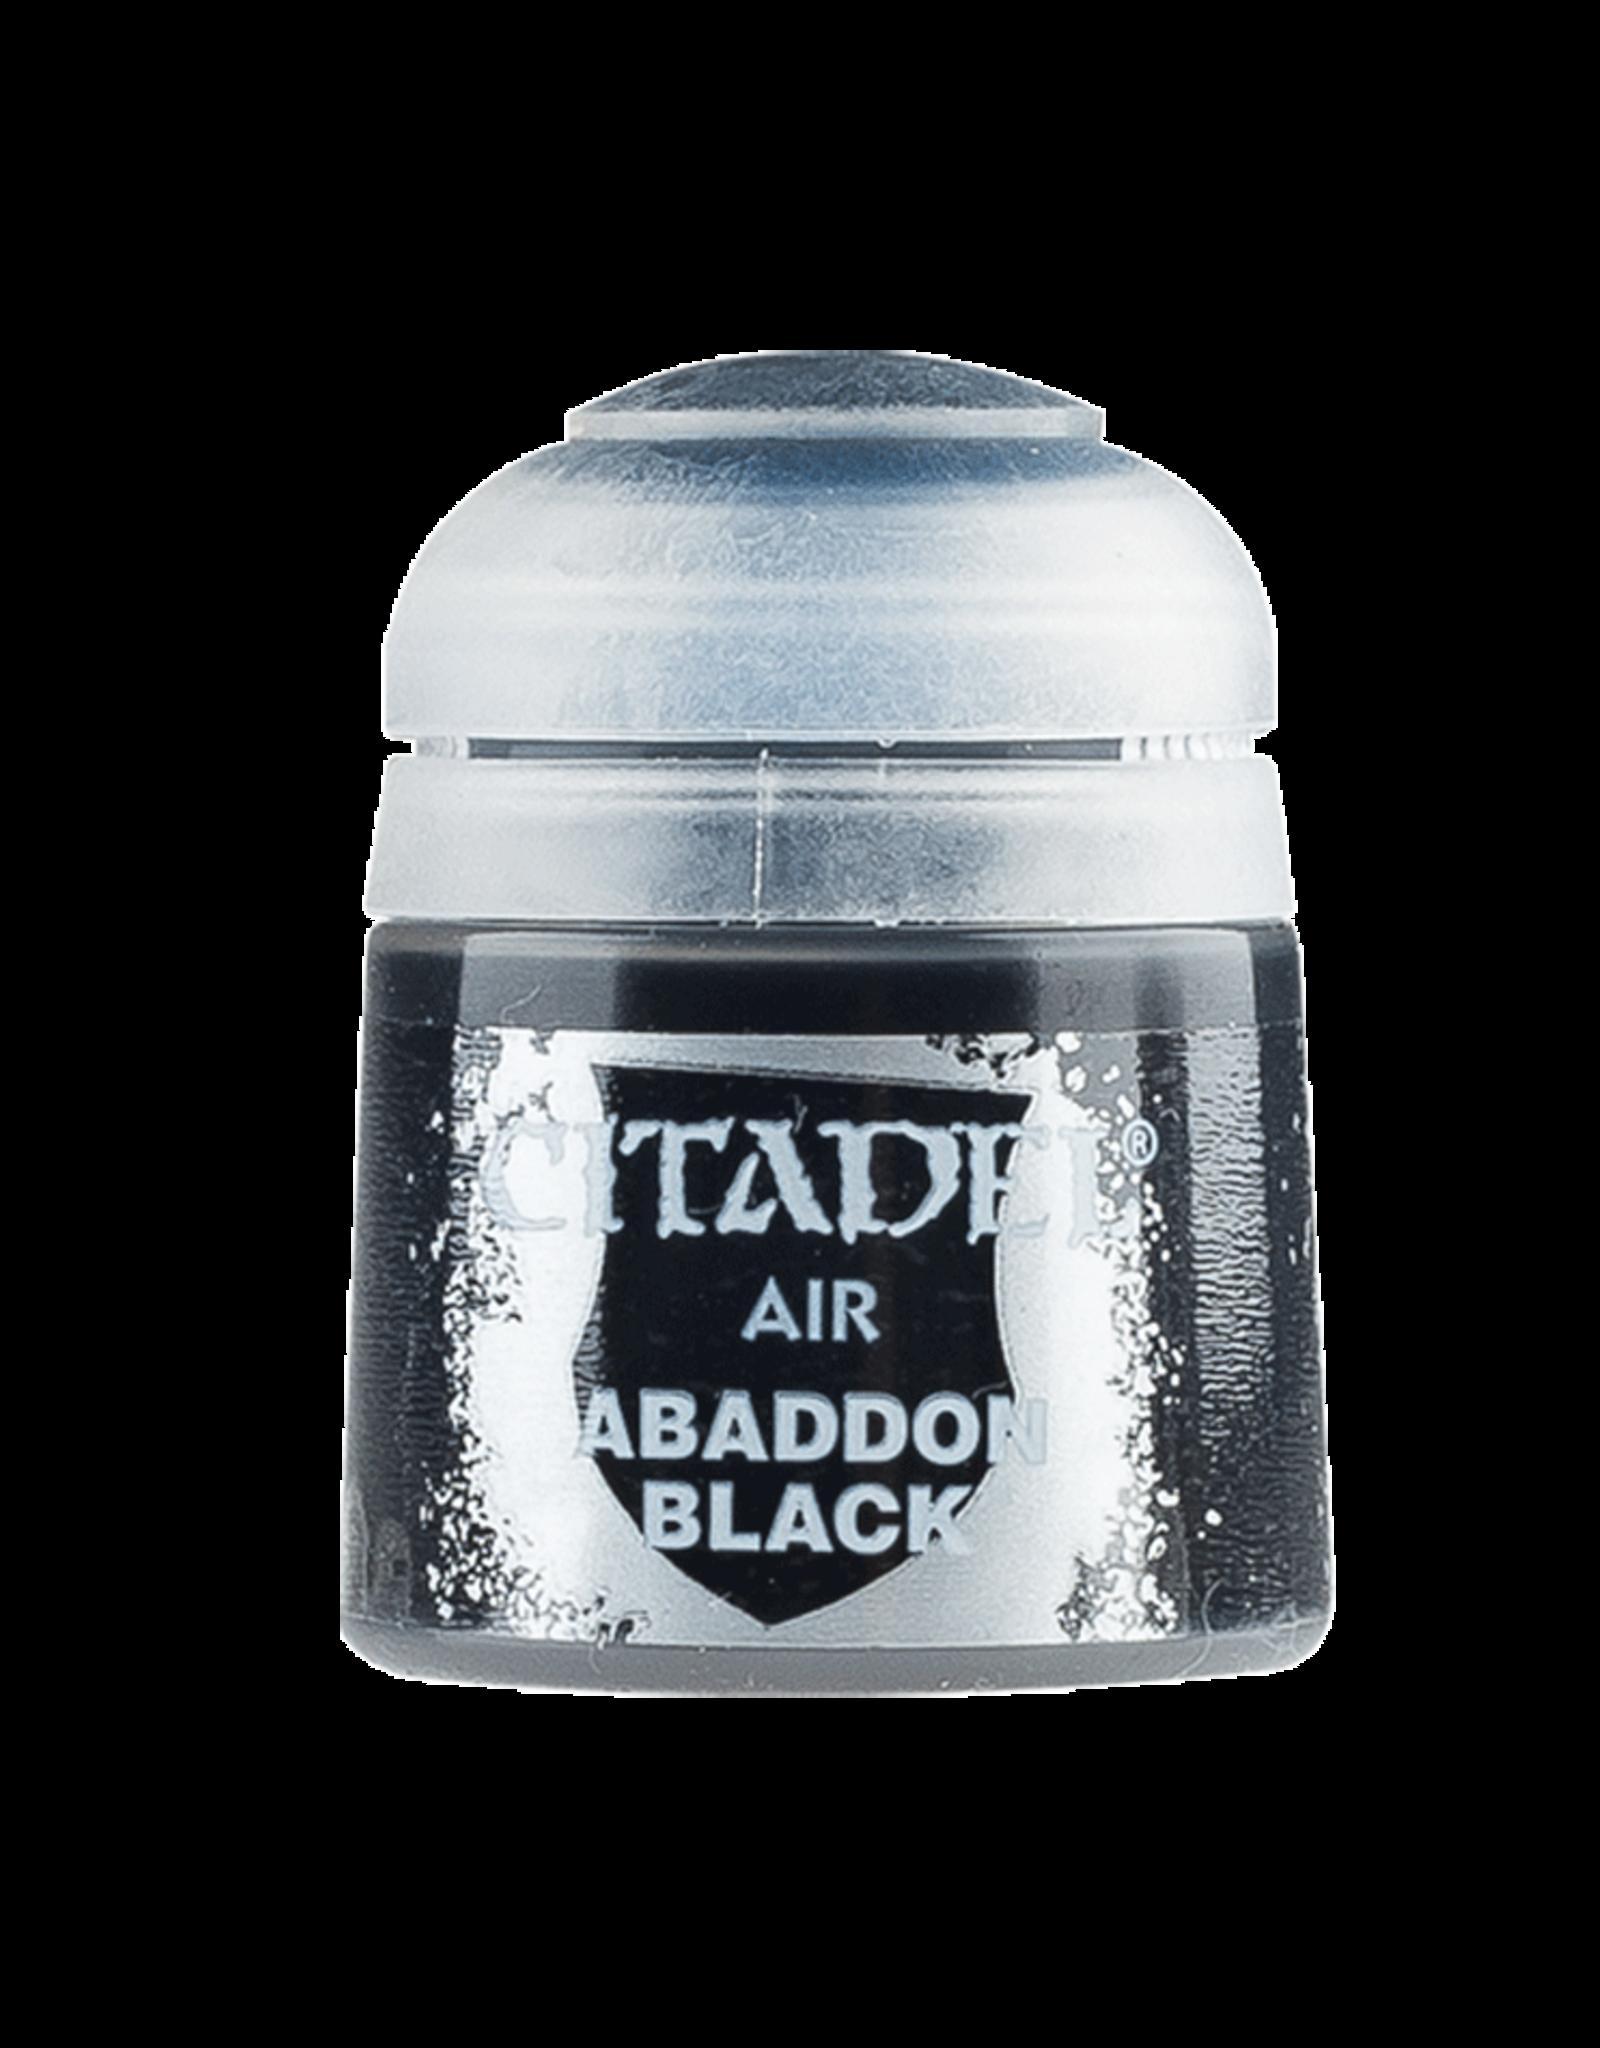 Games Workshop Citadel Air: Abaddon Black (24ml)